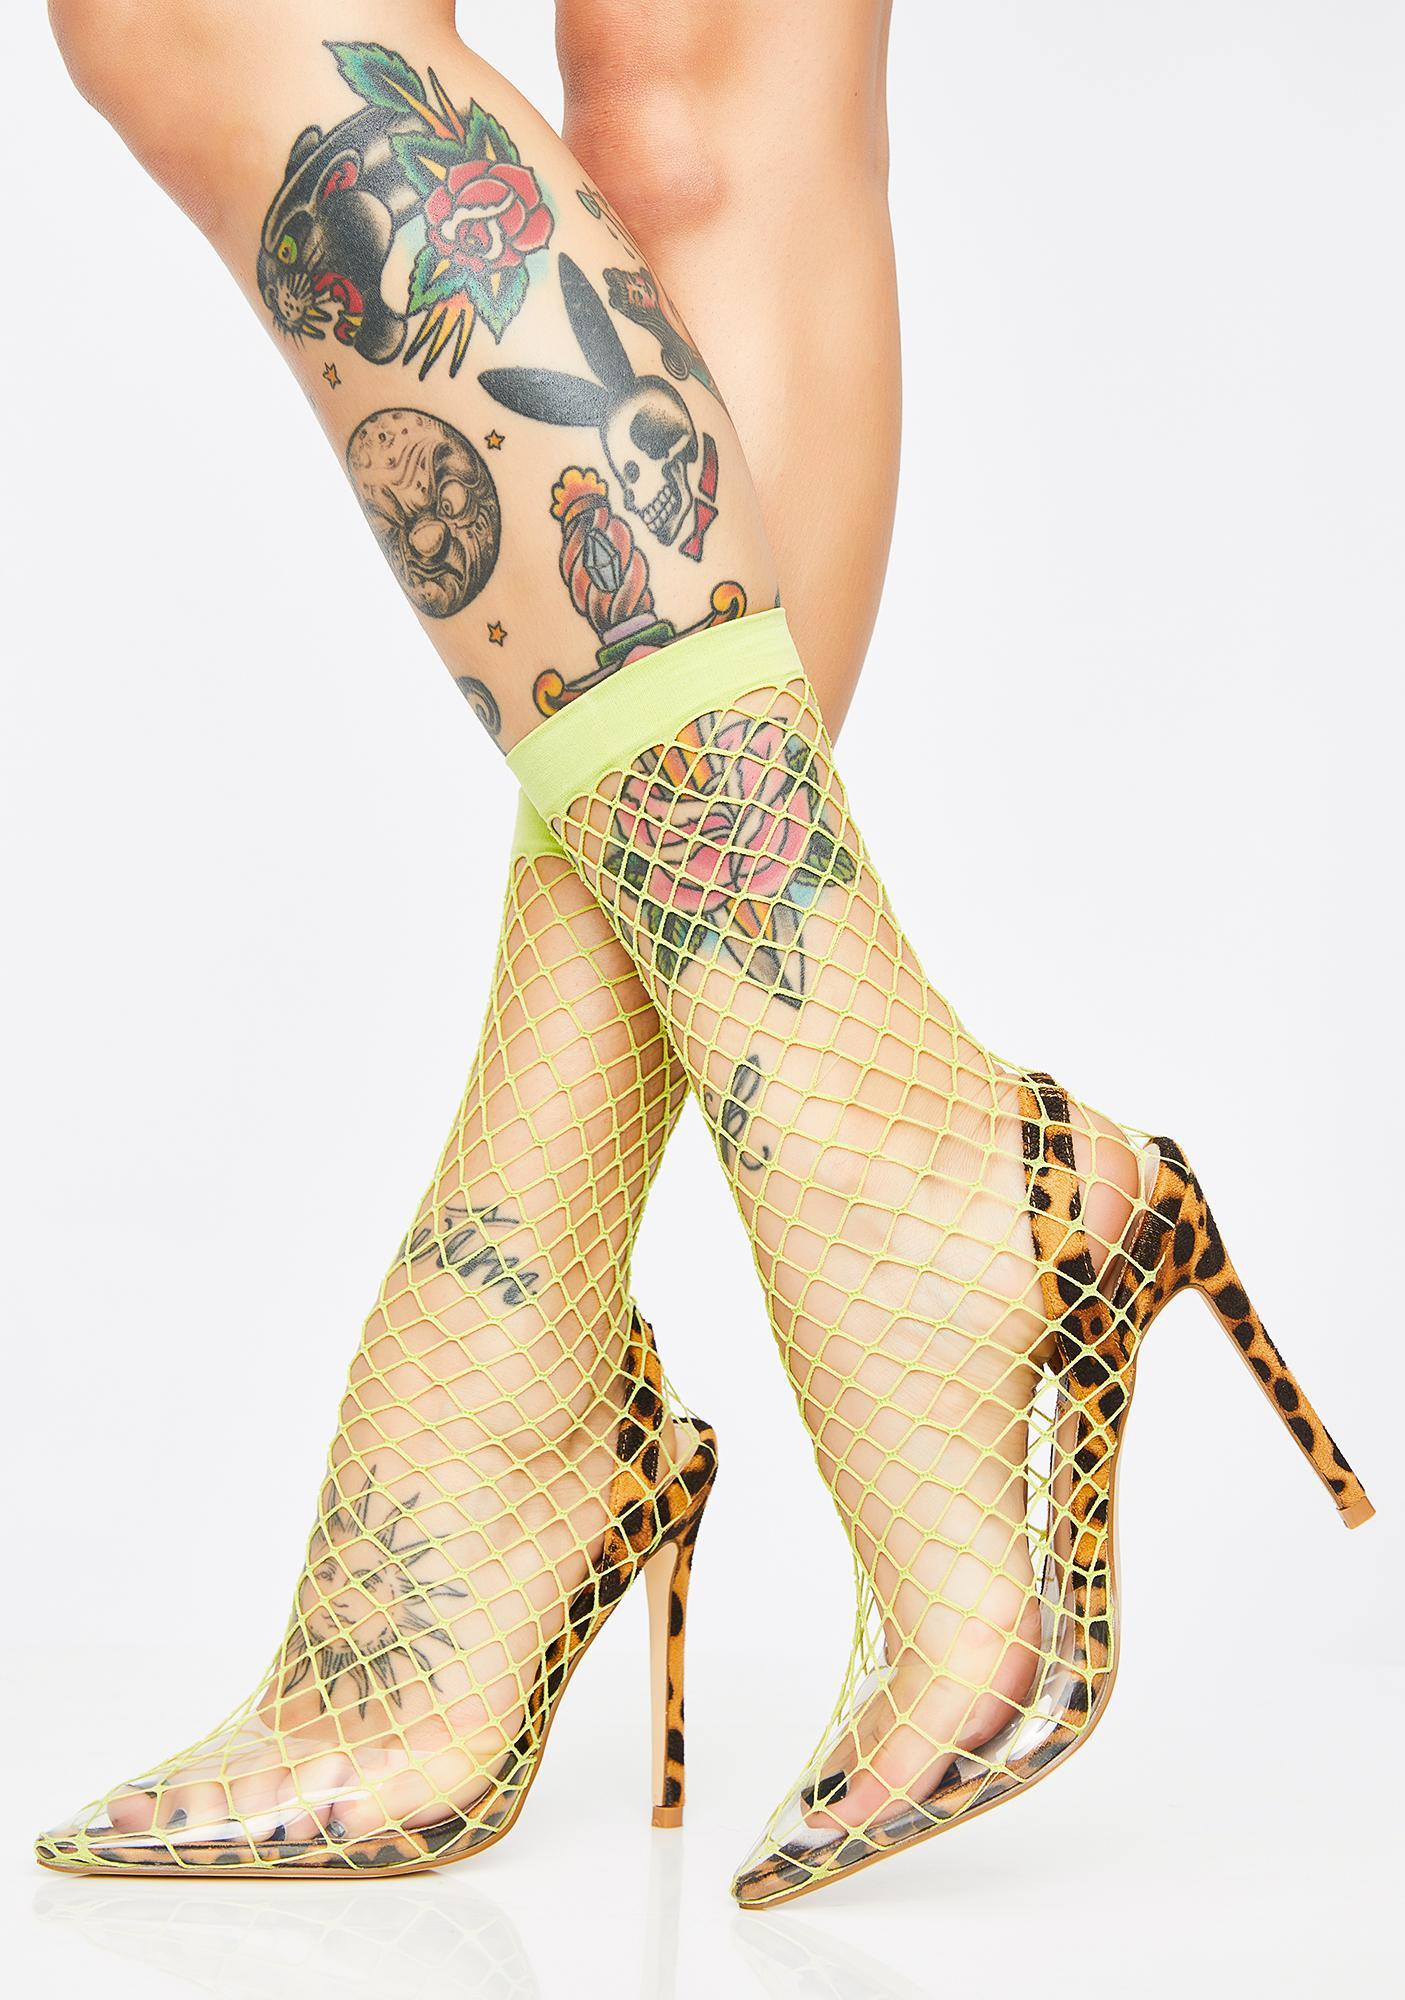 The Hott Friend Fishnet Heels